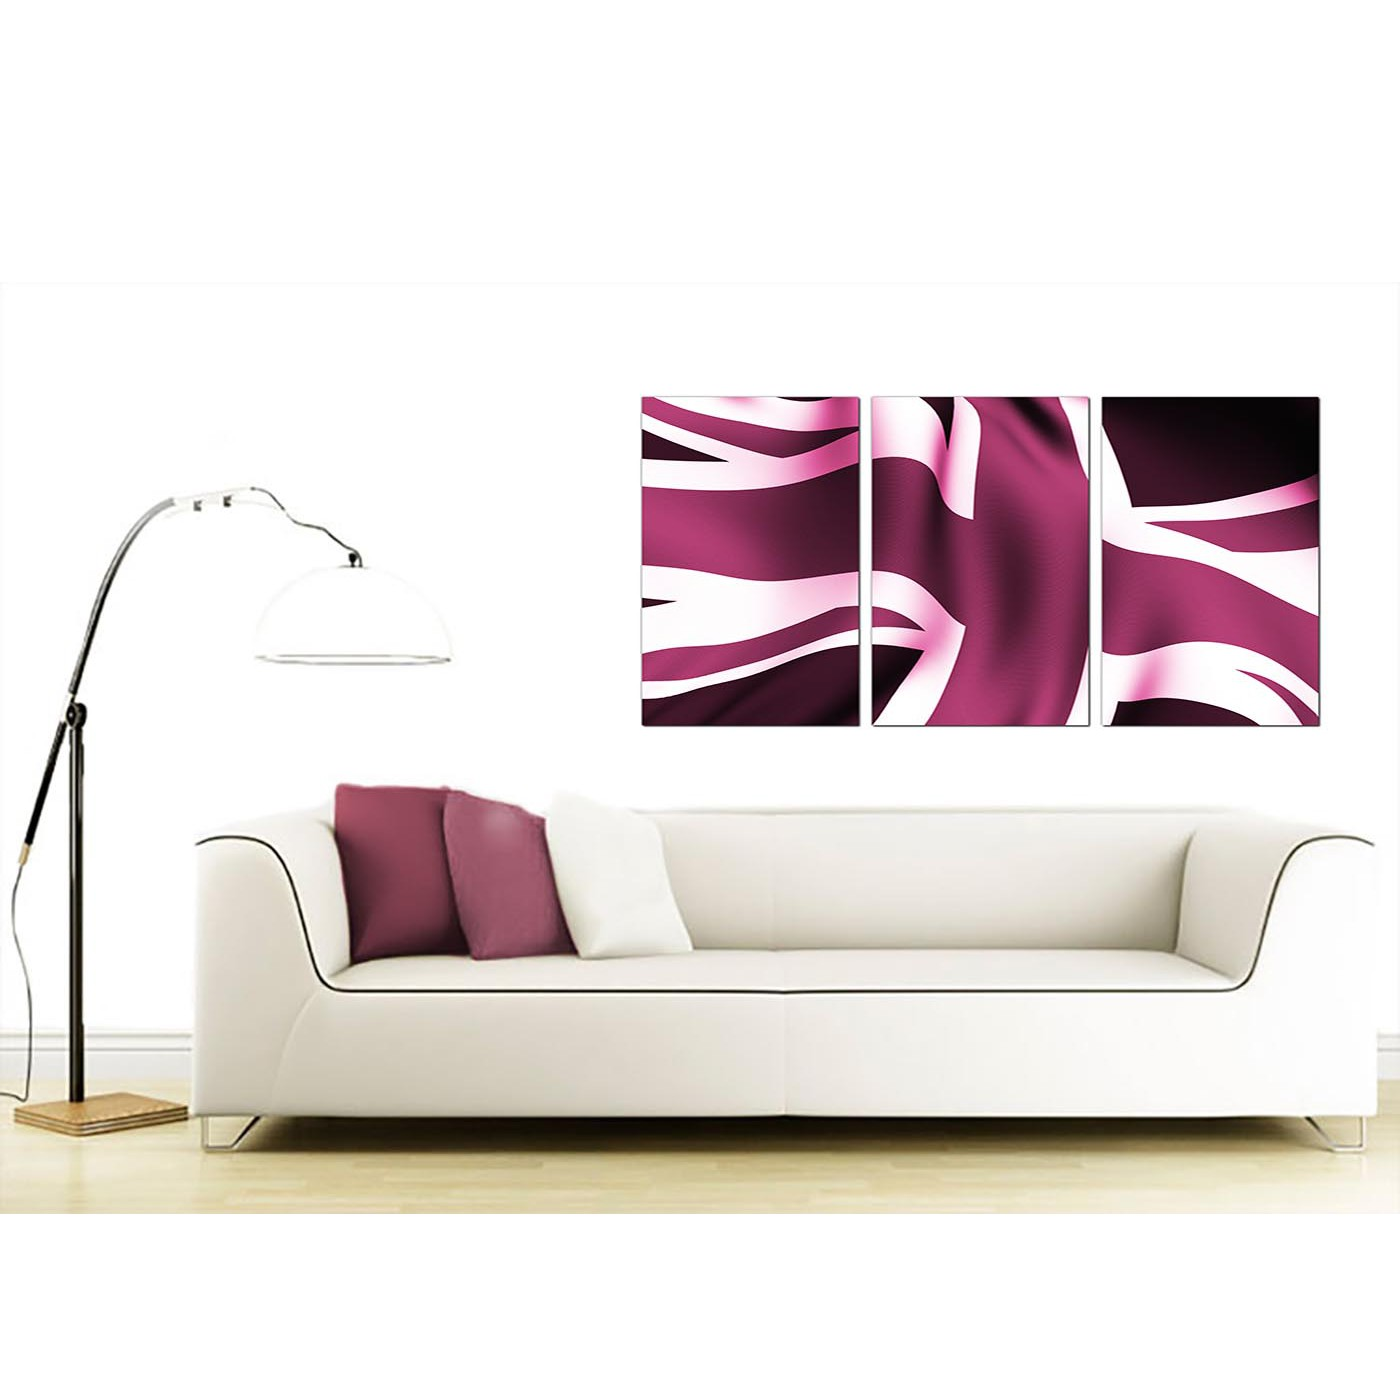 Display Gallery Item 4; Set Of 3 British Flag Canvas Prints UK 125cm X 60cm  3009 Display Gallery Item 5 ...